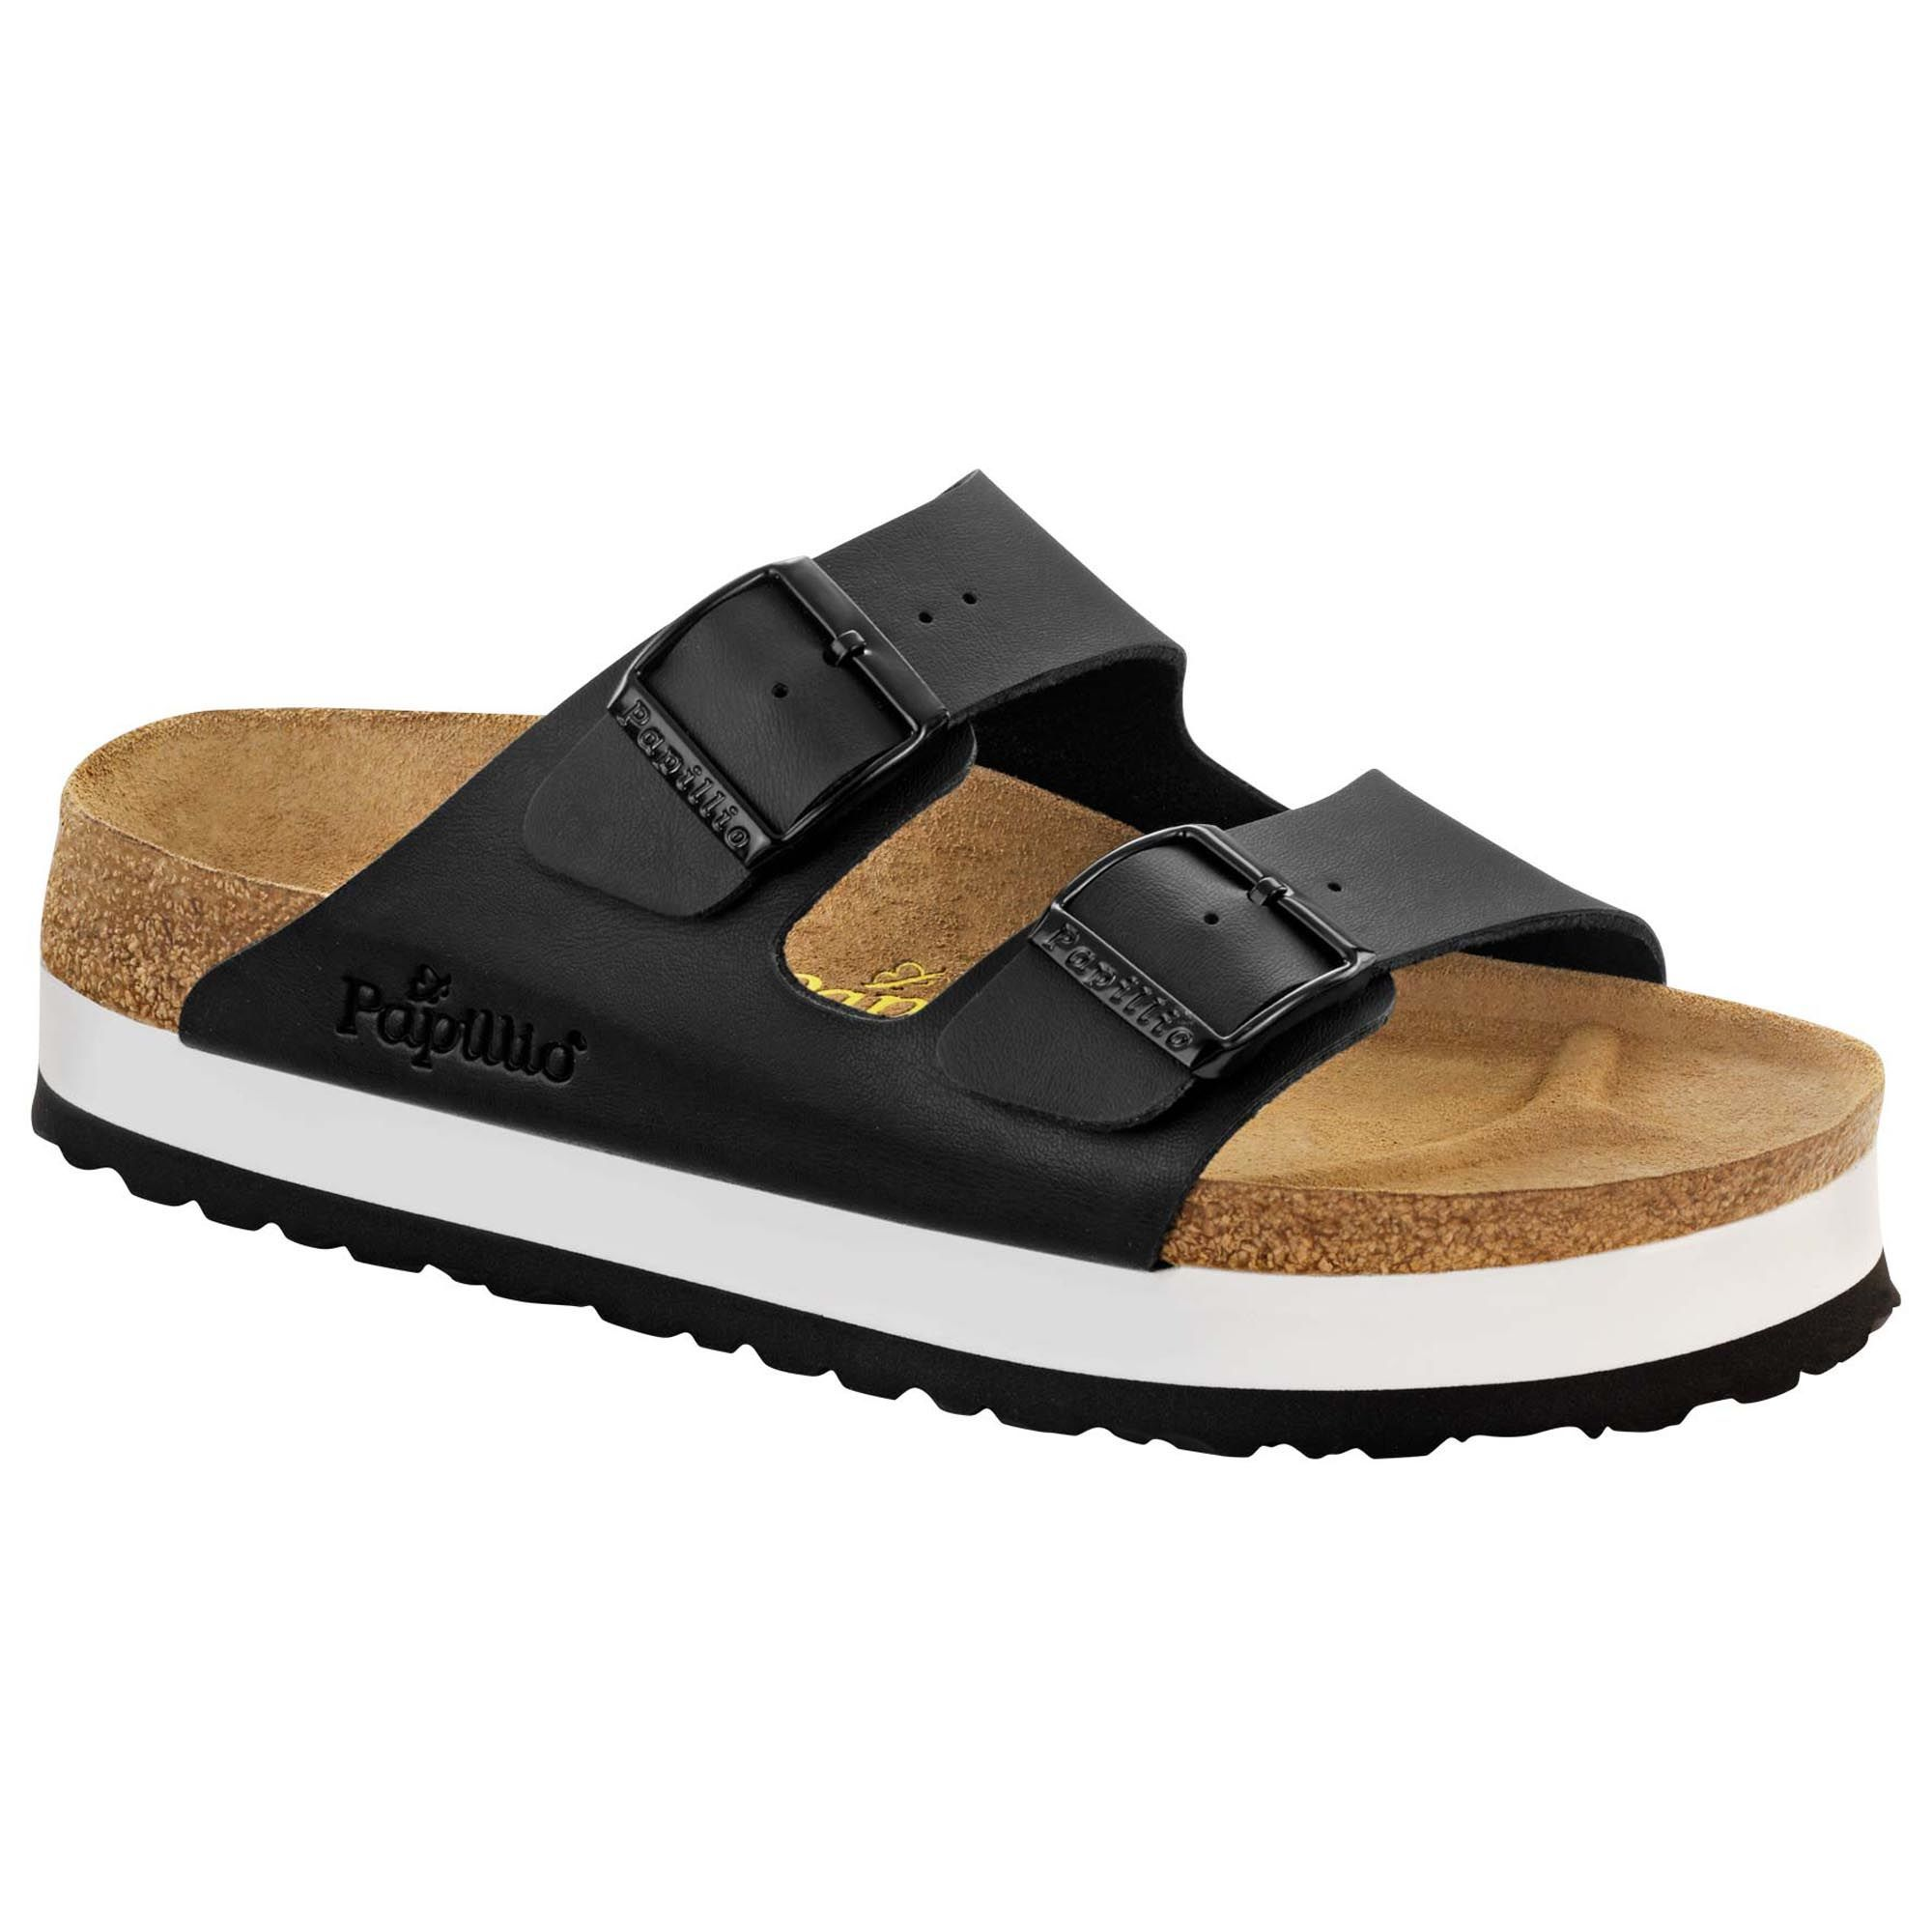 hot sale online 96160 691fc Arizona Birko-Flor Black | Shoes in 2019 | Birkenstock ...